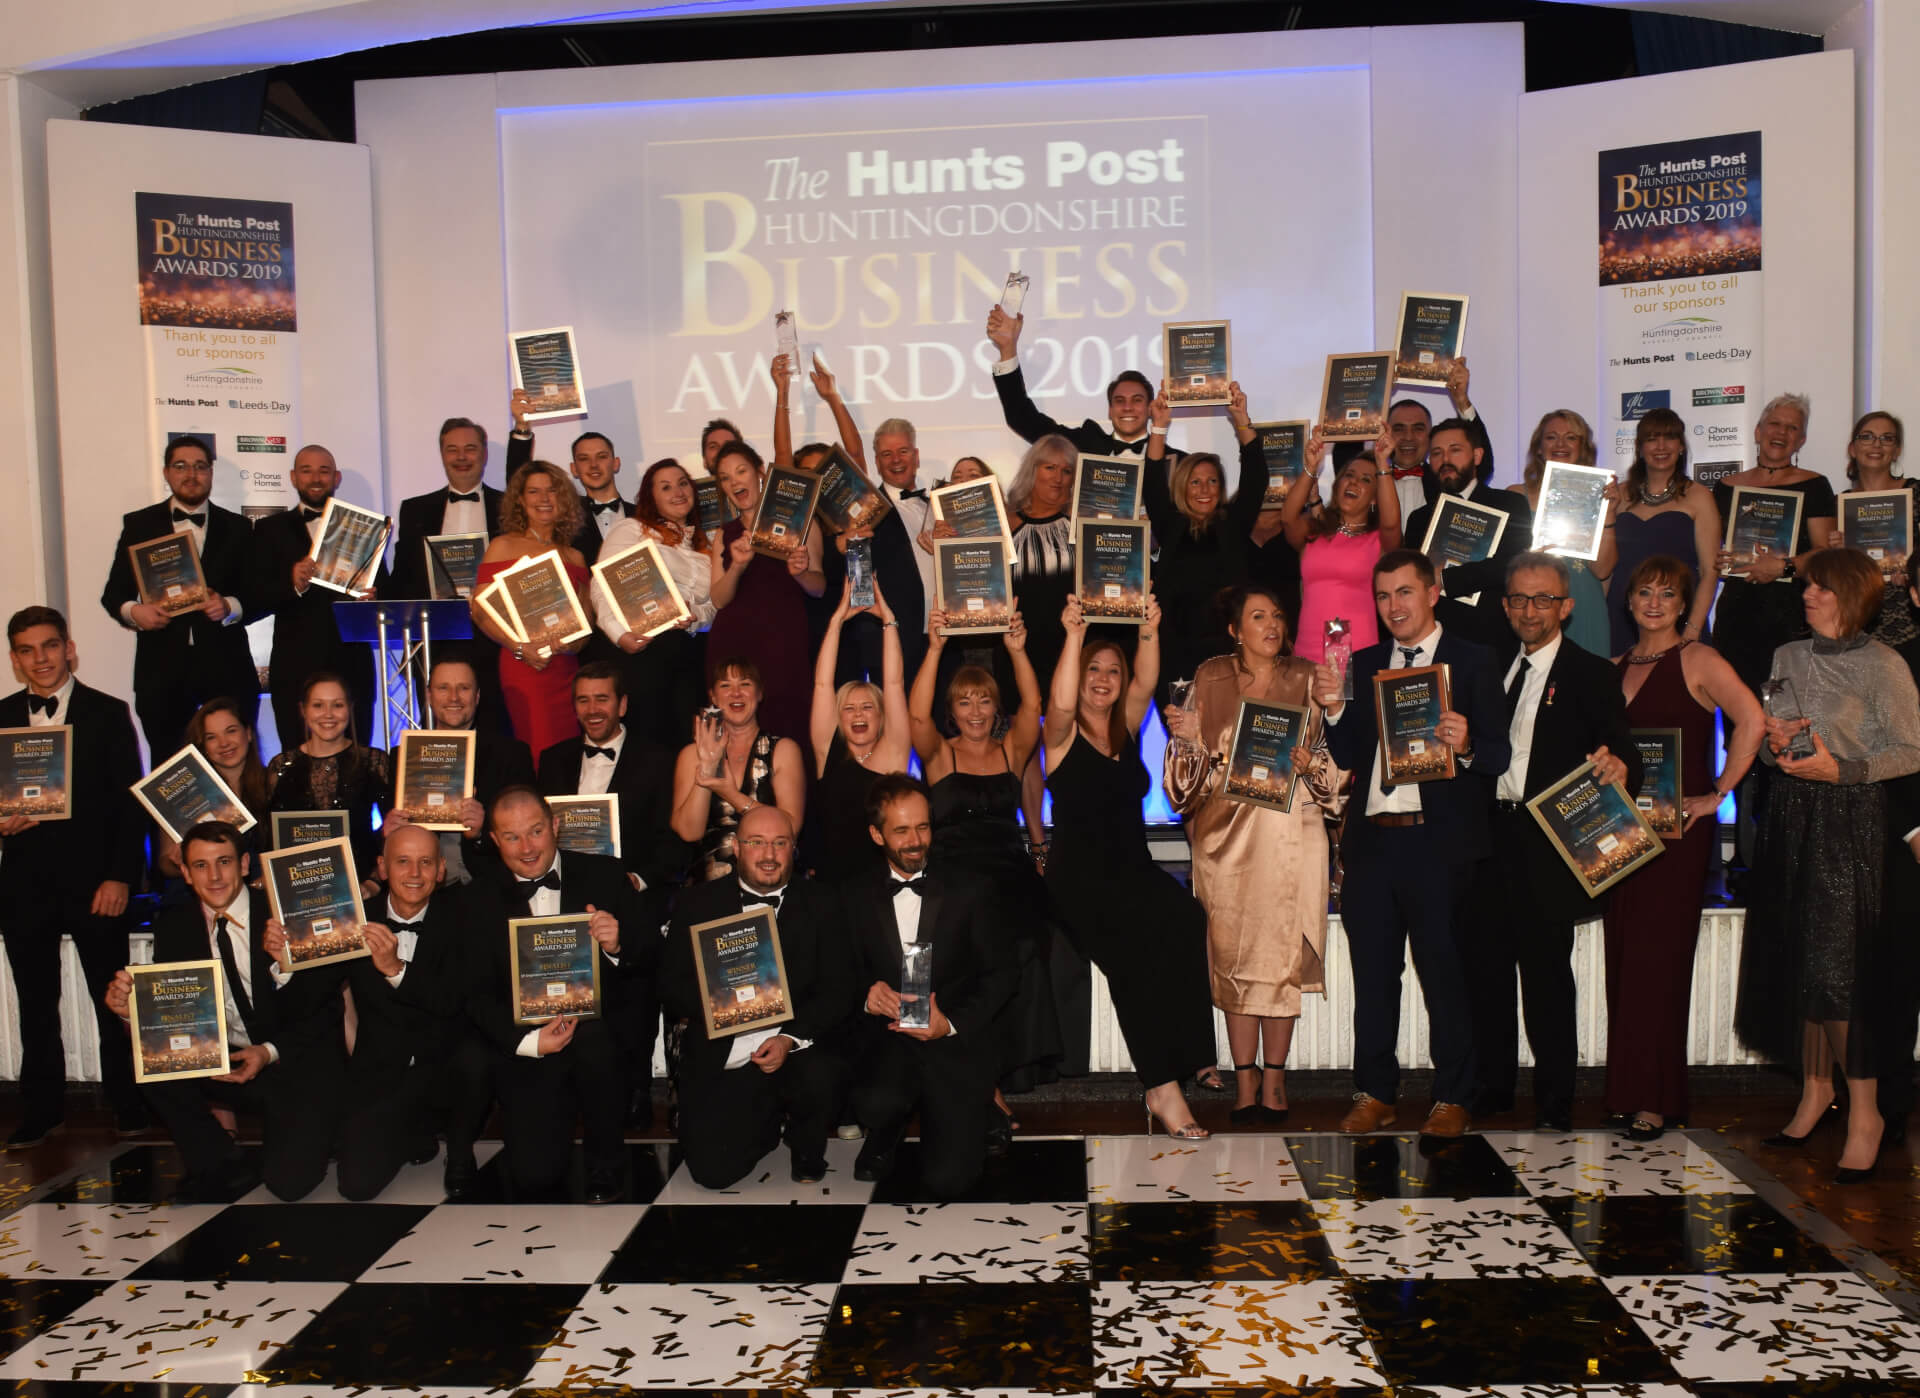 The Hunts Post Business Awards 2019 Winners